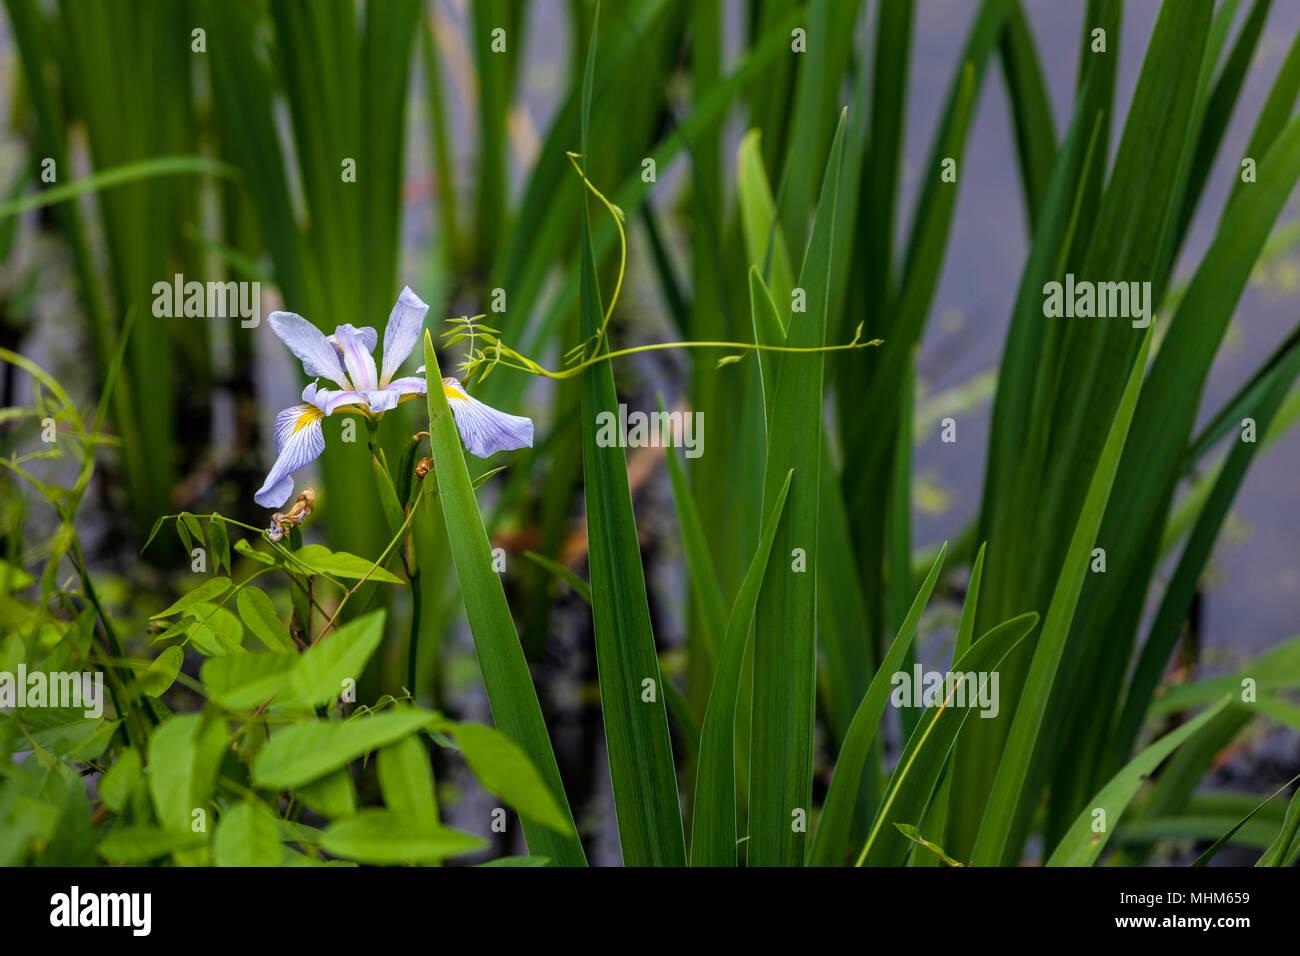 NC01820-00...NORTH CAROLINA - Wild iris flower in Merchants Millpond State Park. Stock Photo